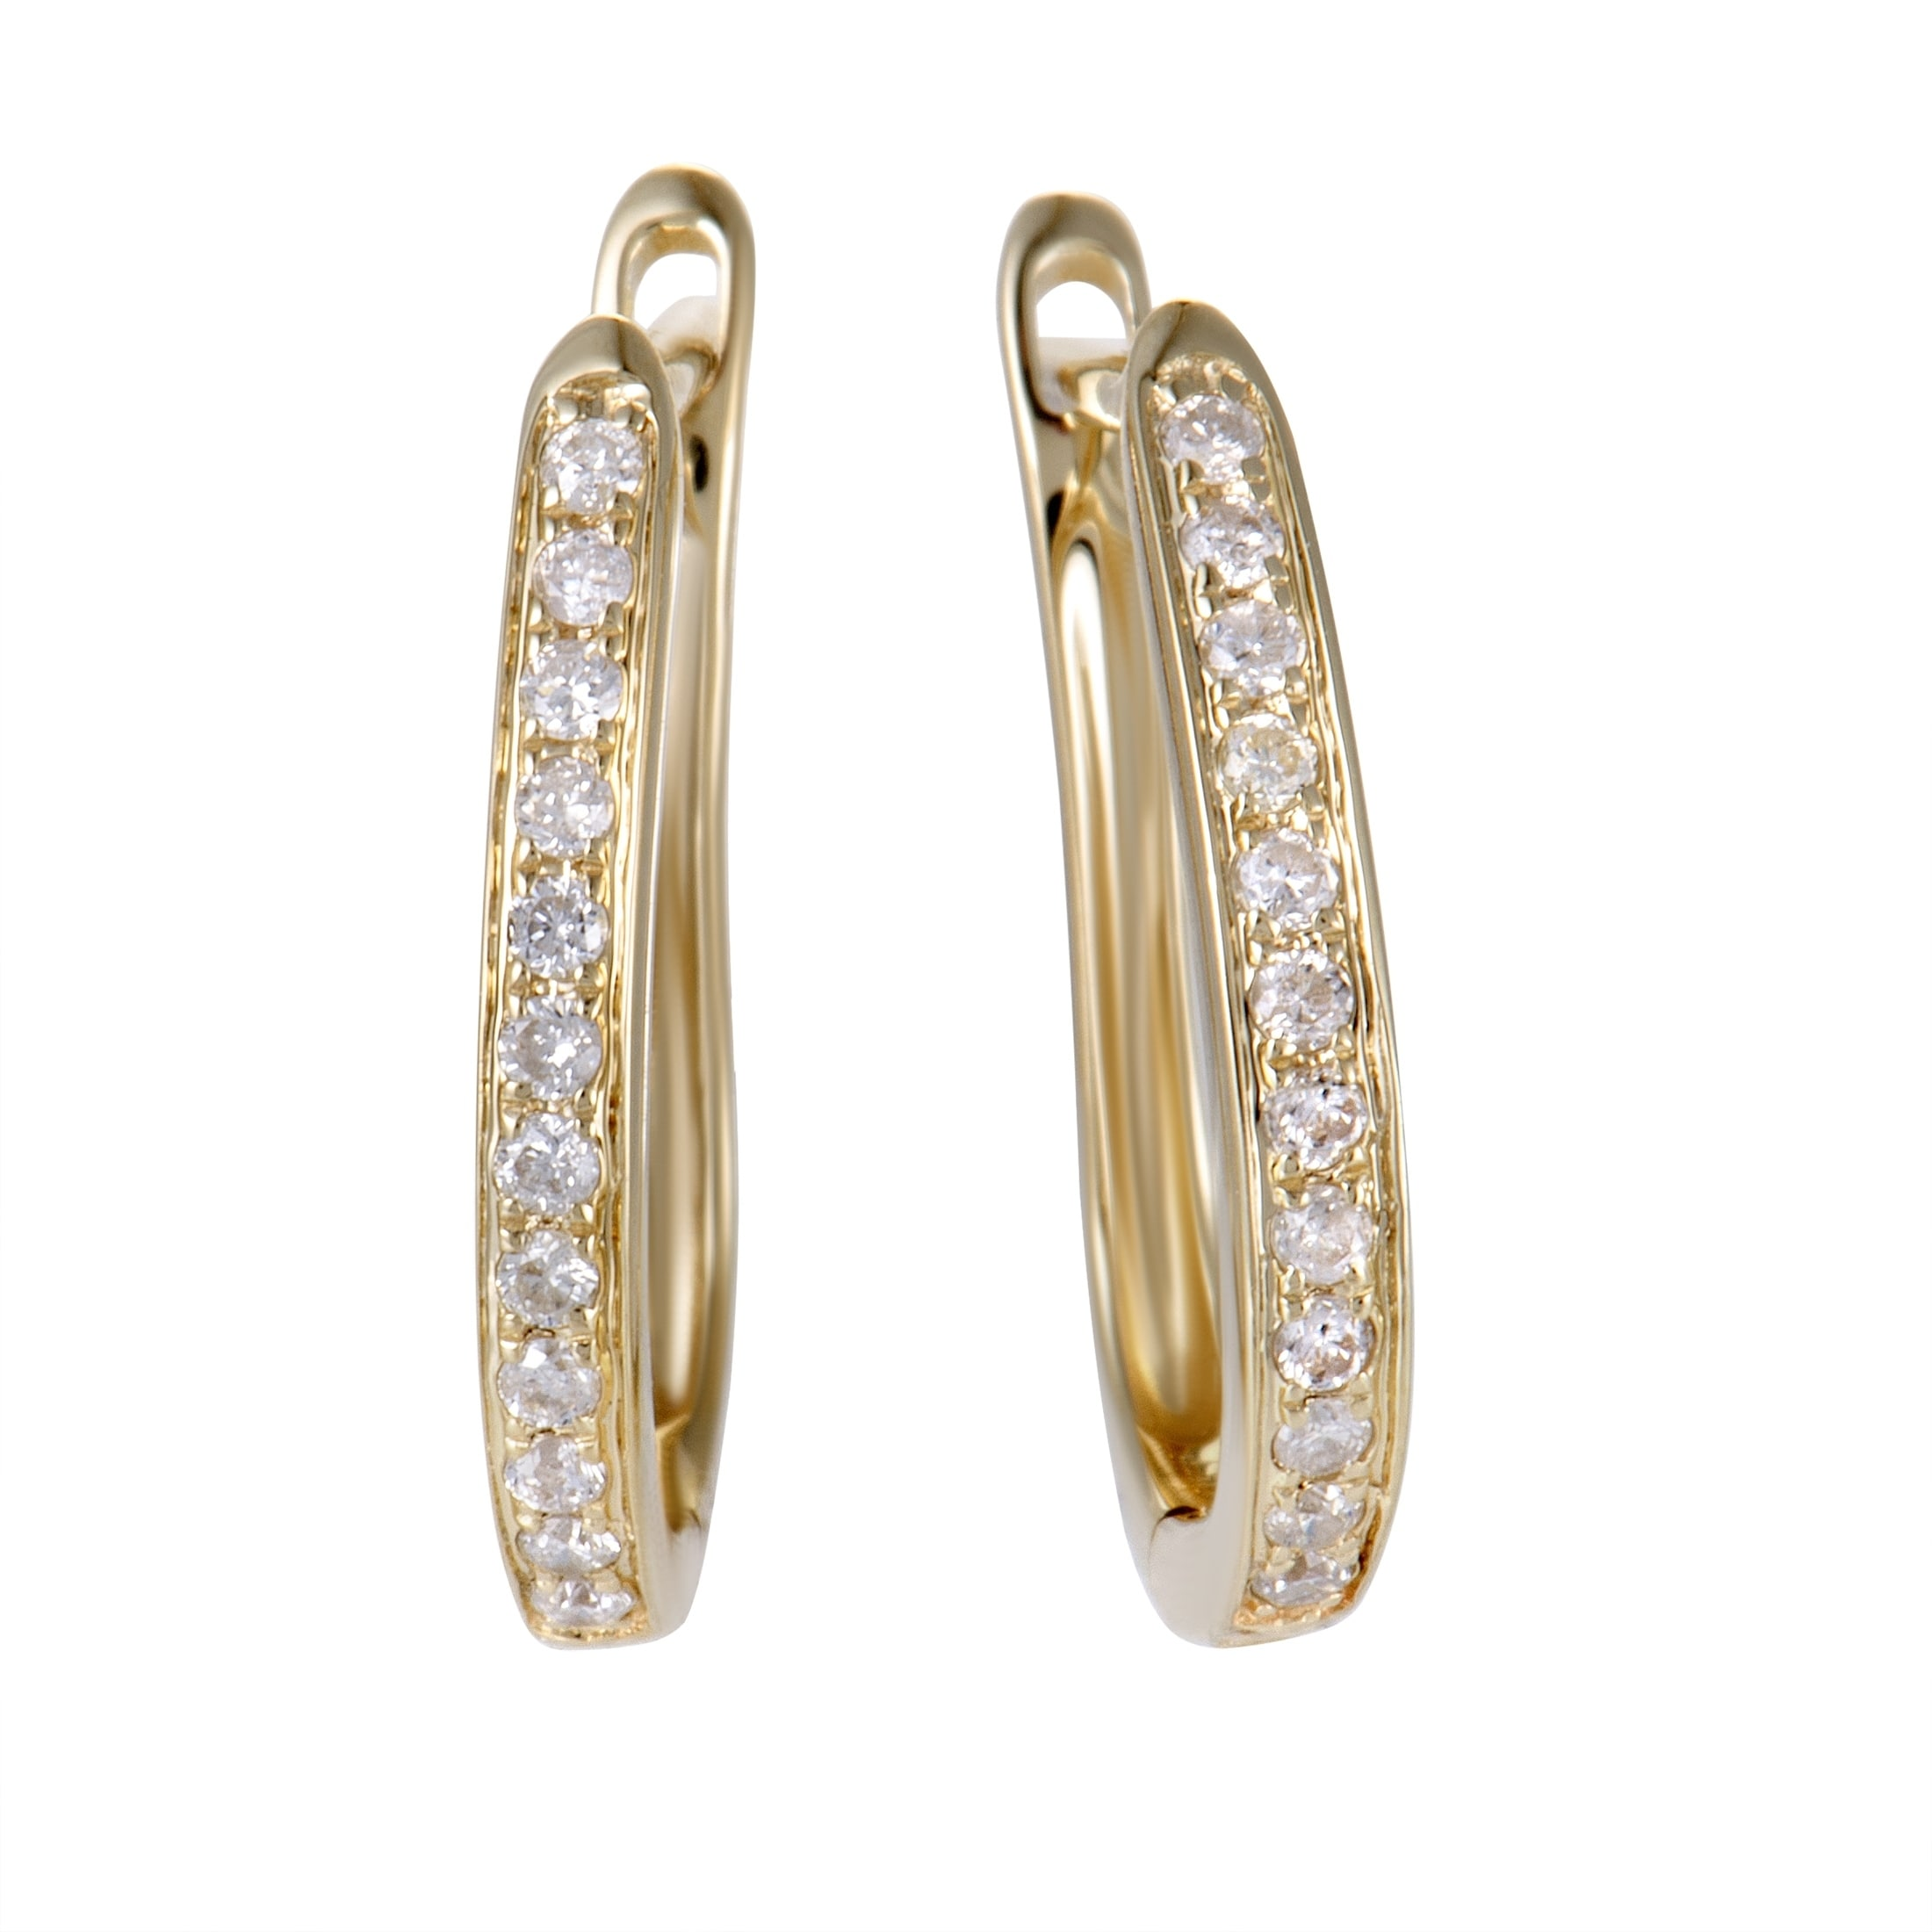 25ct Small Yellow Gold Diamond Hoop Earrings